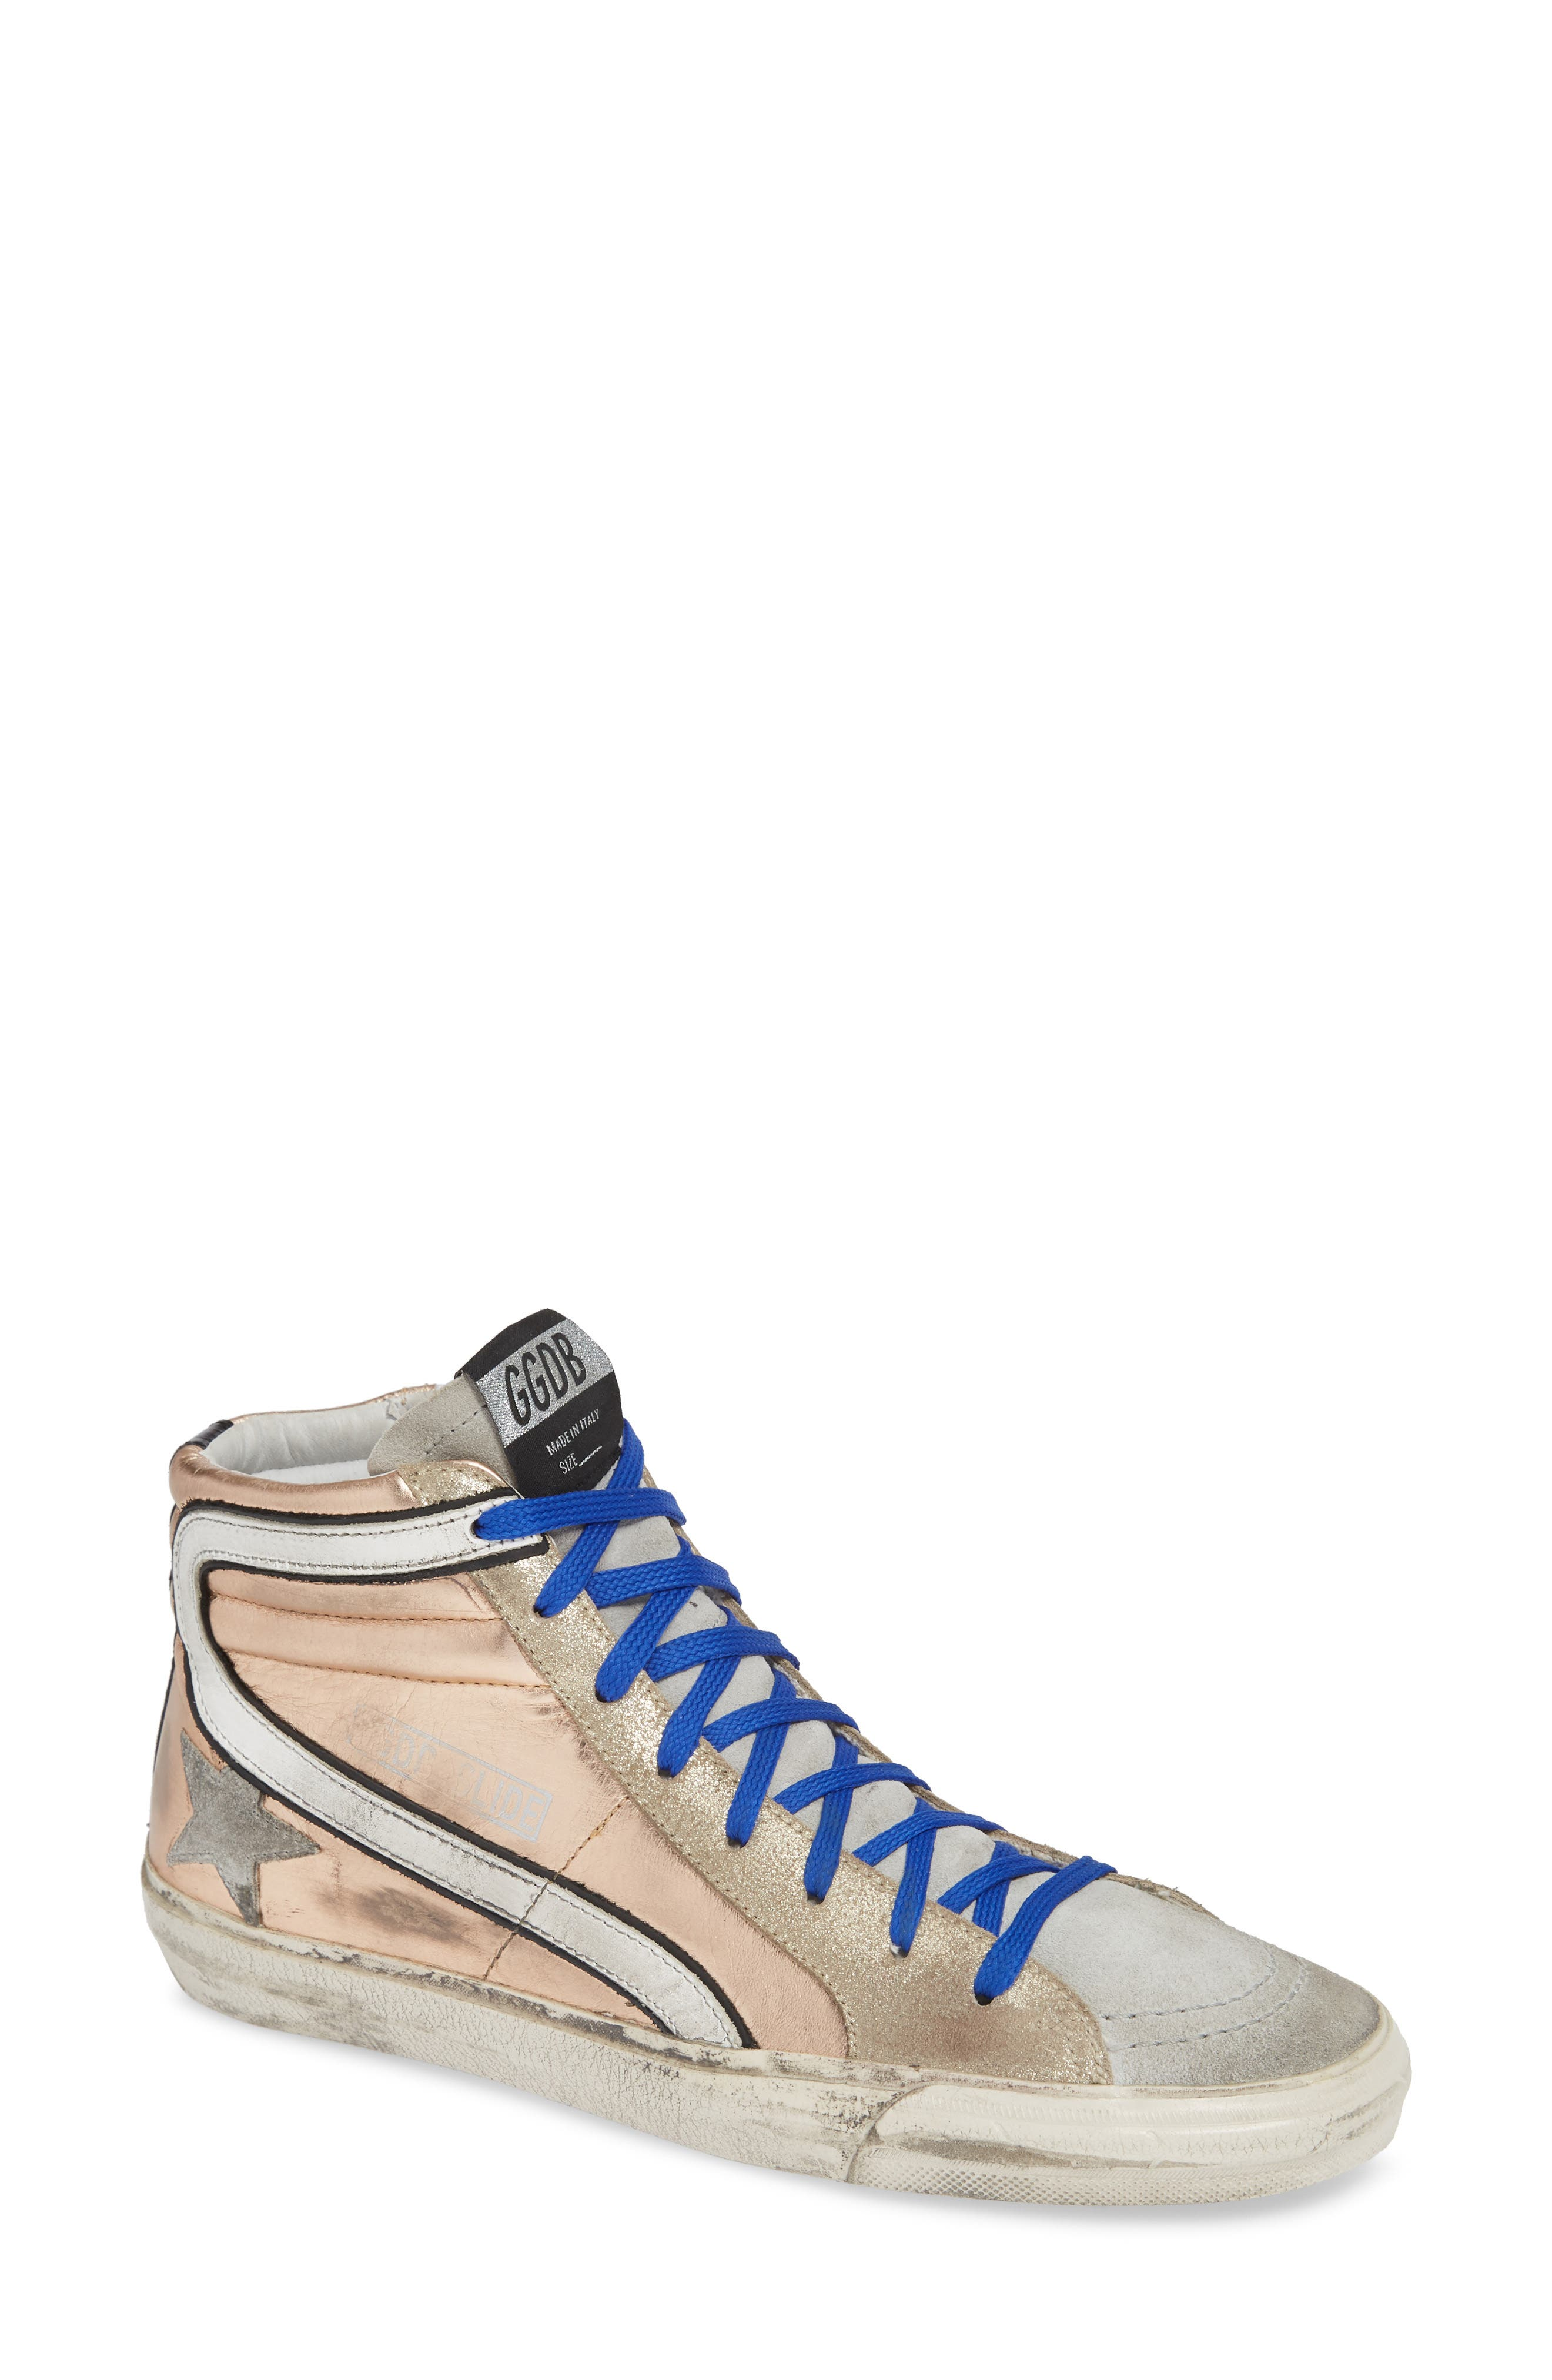 High Top Sneaker,                         Main,                         color, ROSE GOLD/ GREY